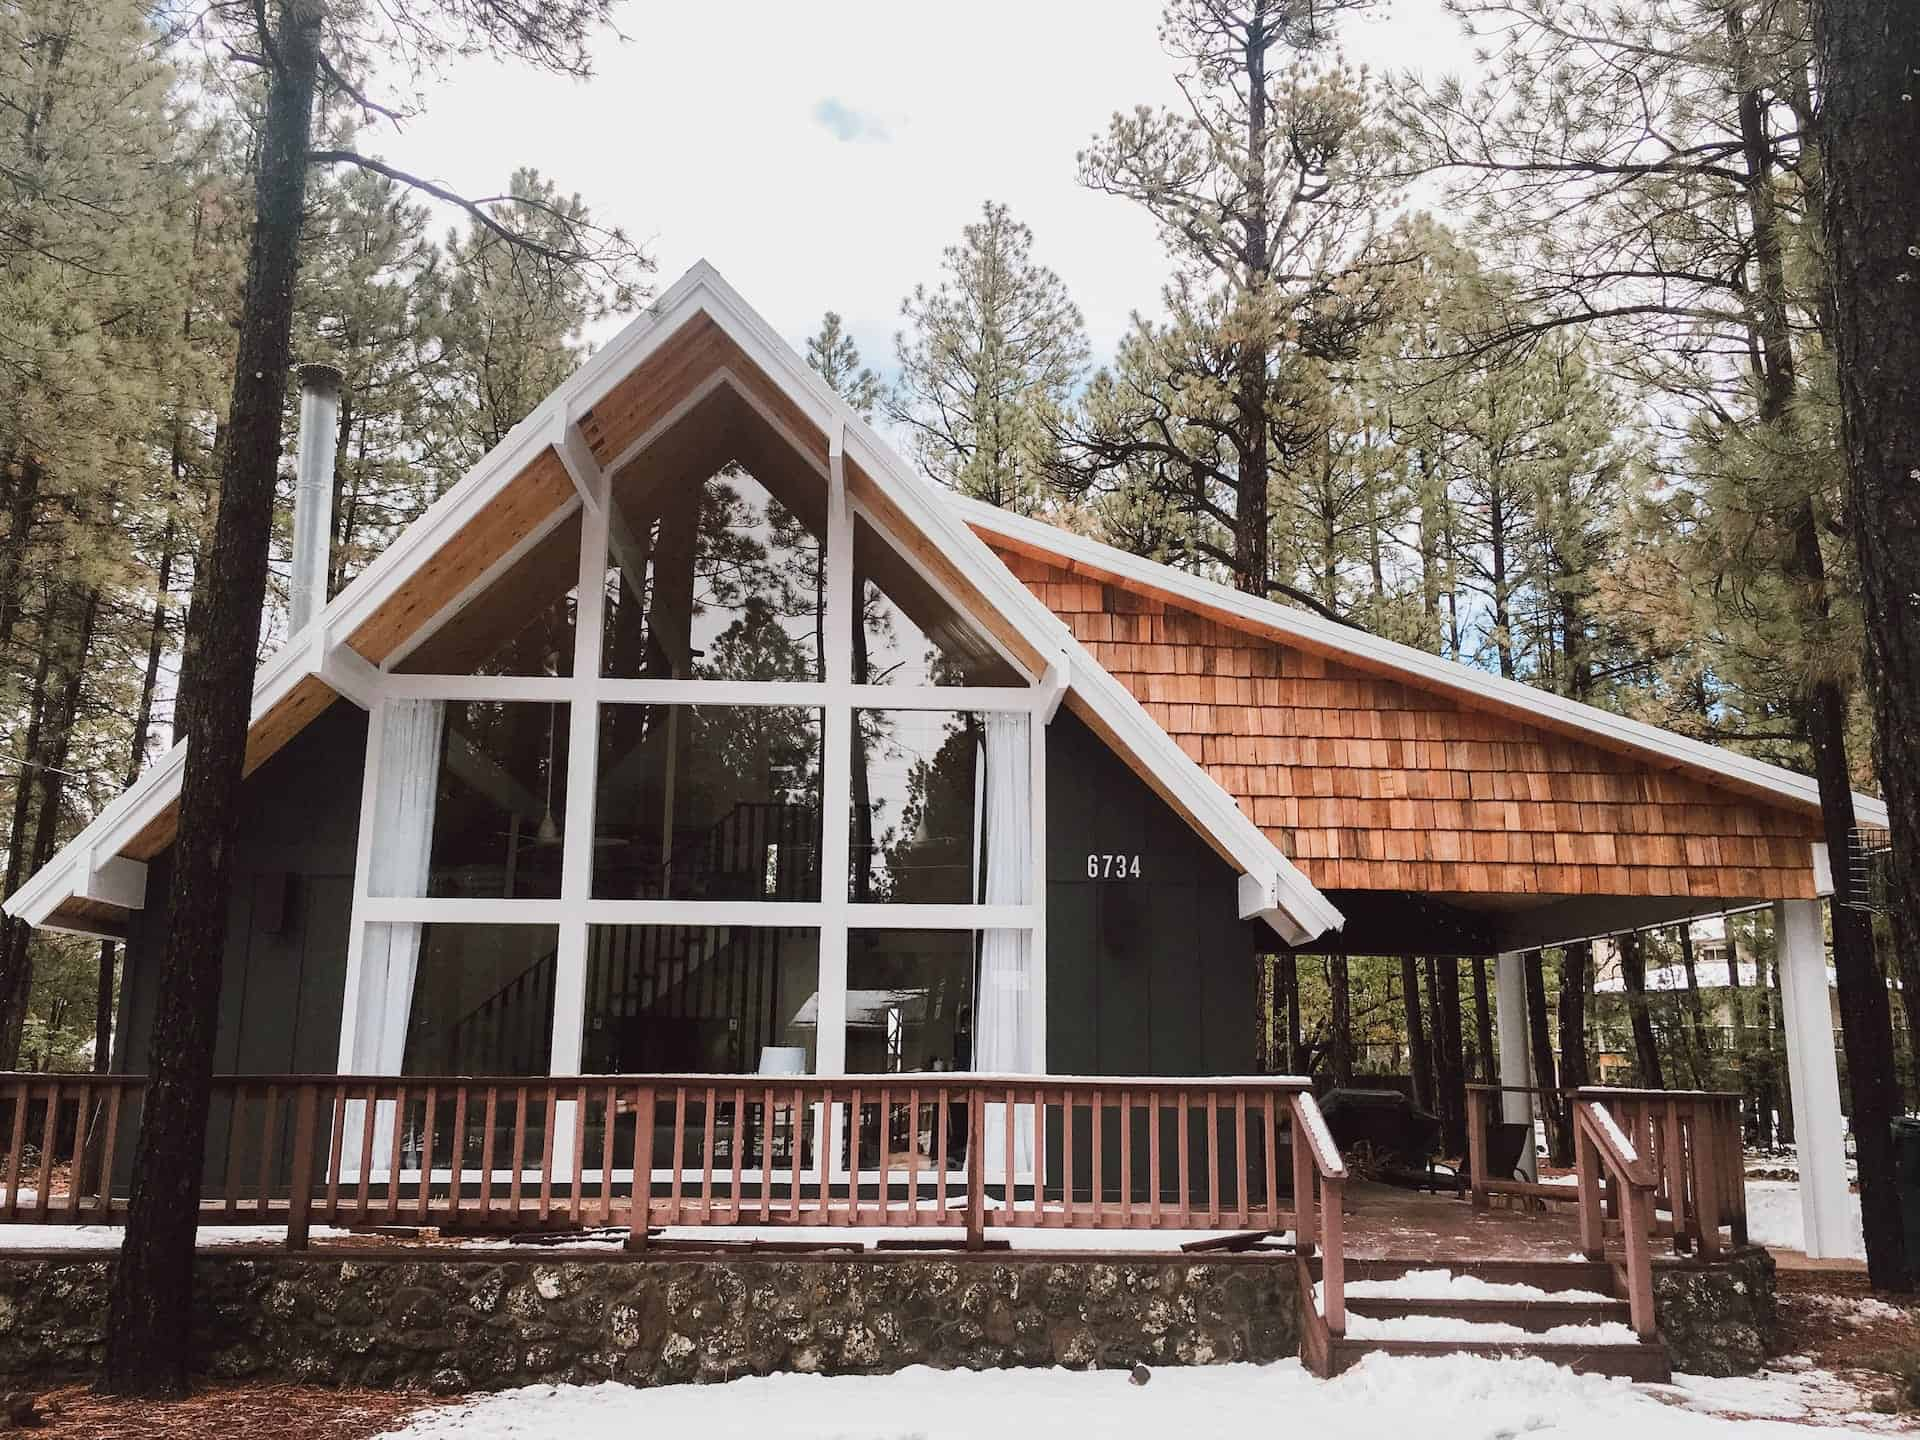 Image of luxury cabin in Pinetop, Arizona